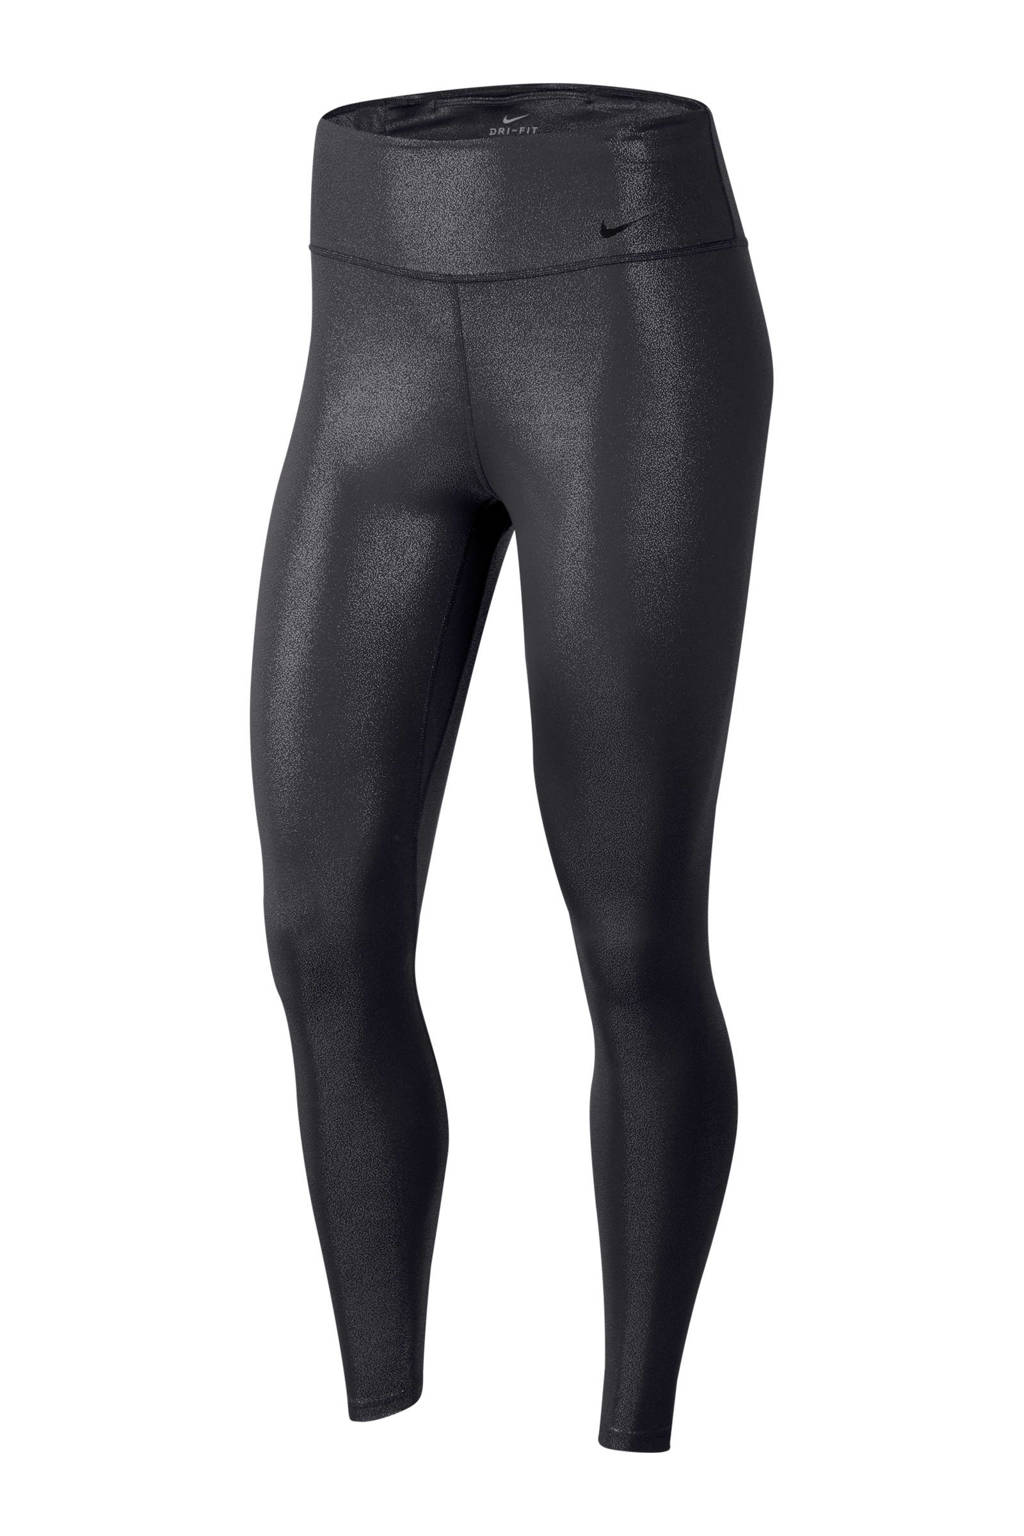 Nike 7/8 sportbroek zwart, Zwart